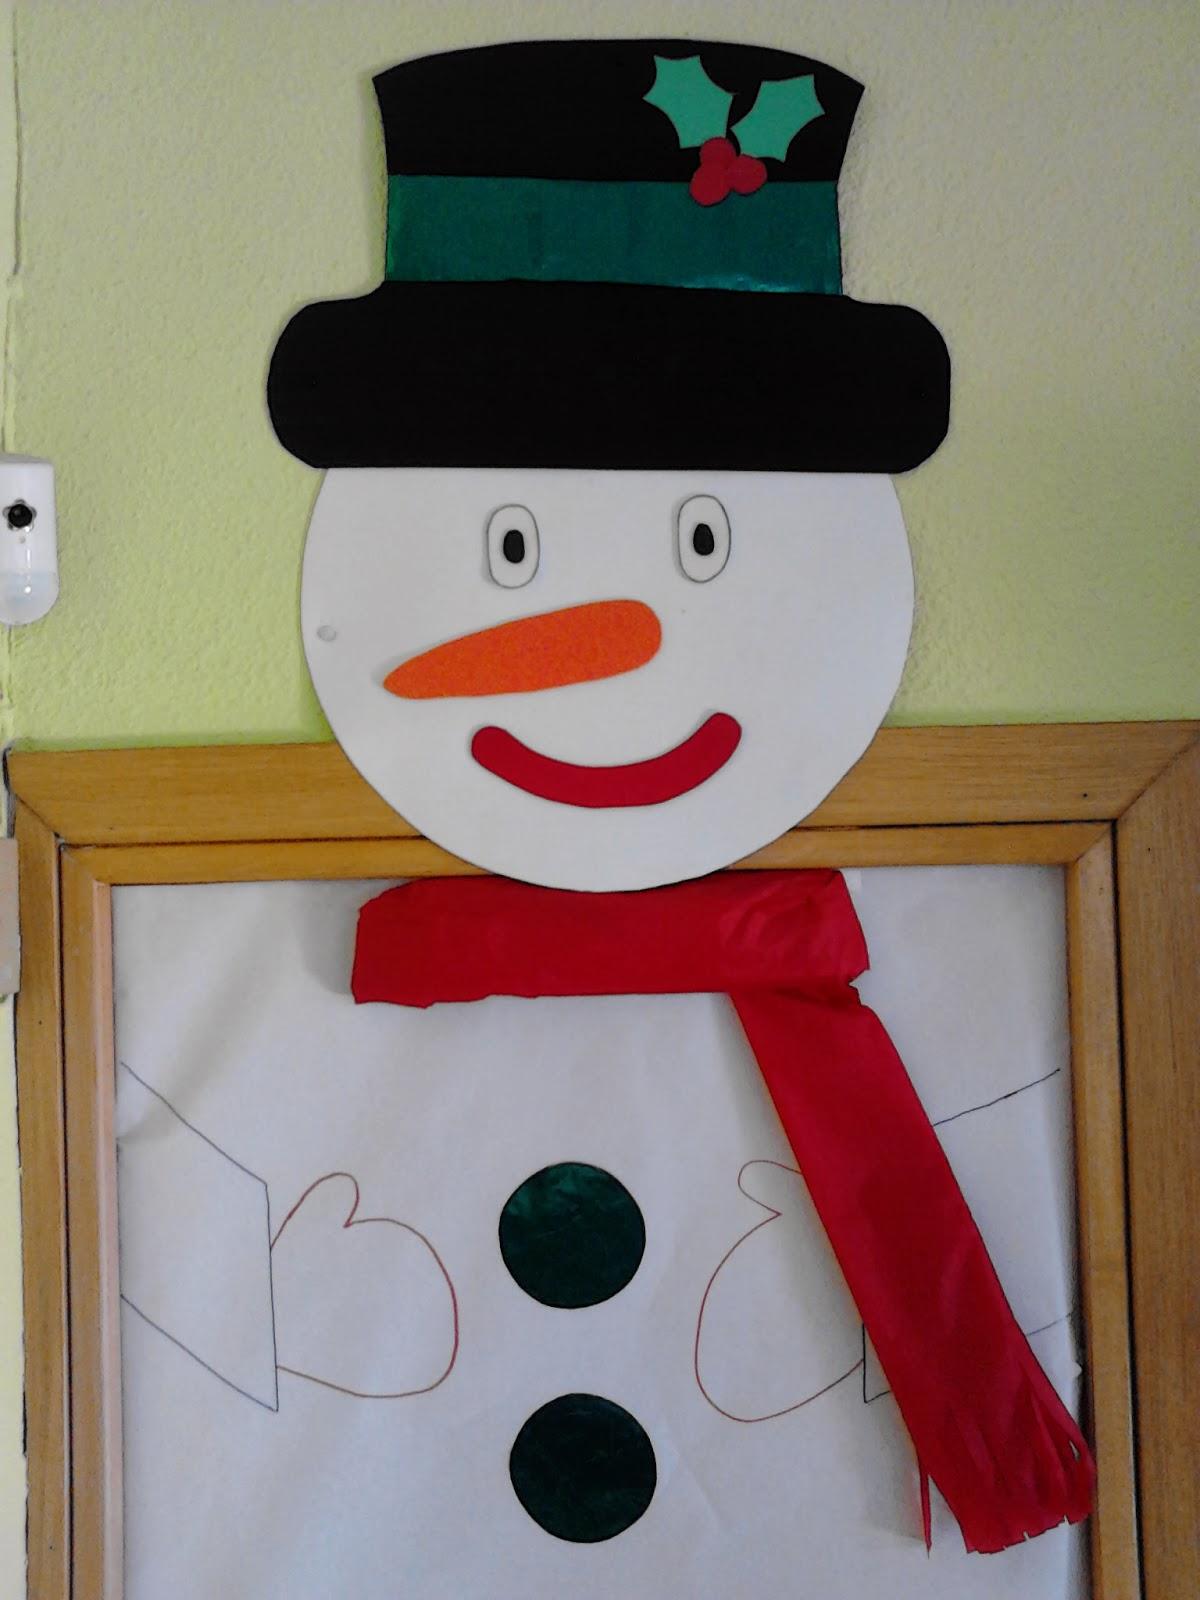 Escuela infantil pis pas diciembre 2013 for Decoracion navidena para puertas